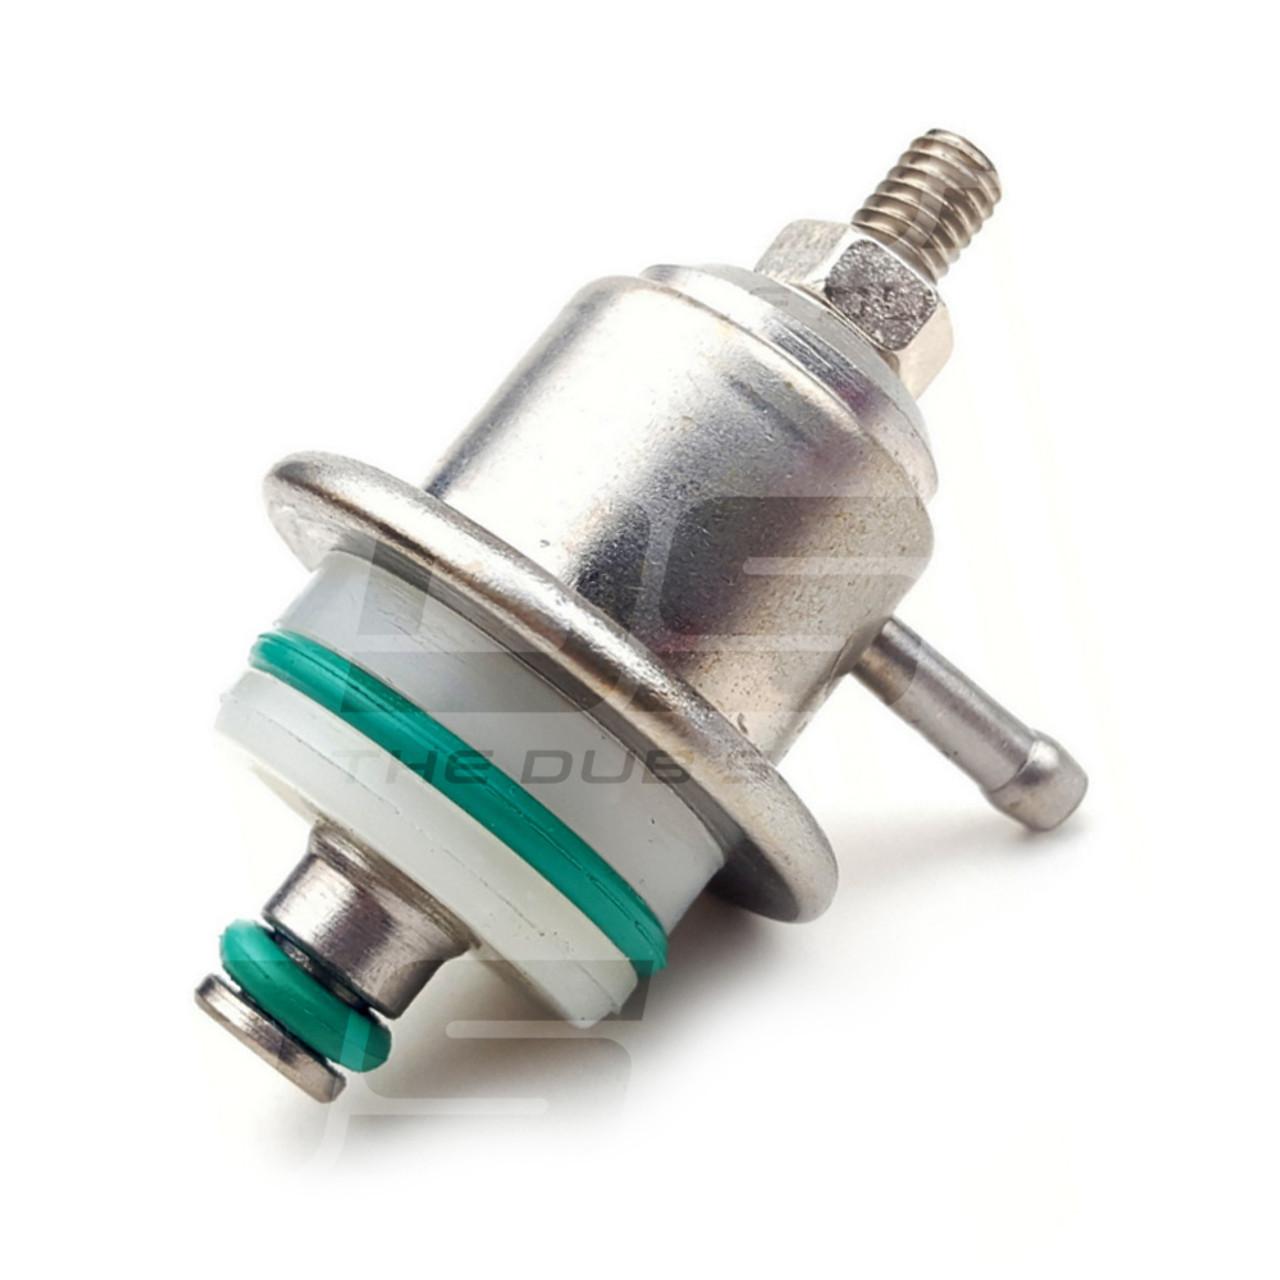 medium resolution of adjustable fuel pressure regulator 3 to 5 bar